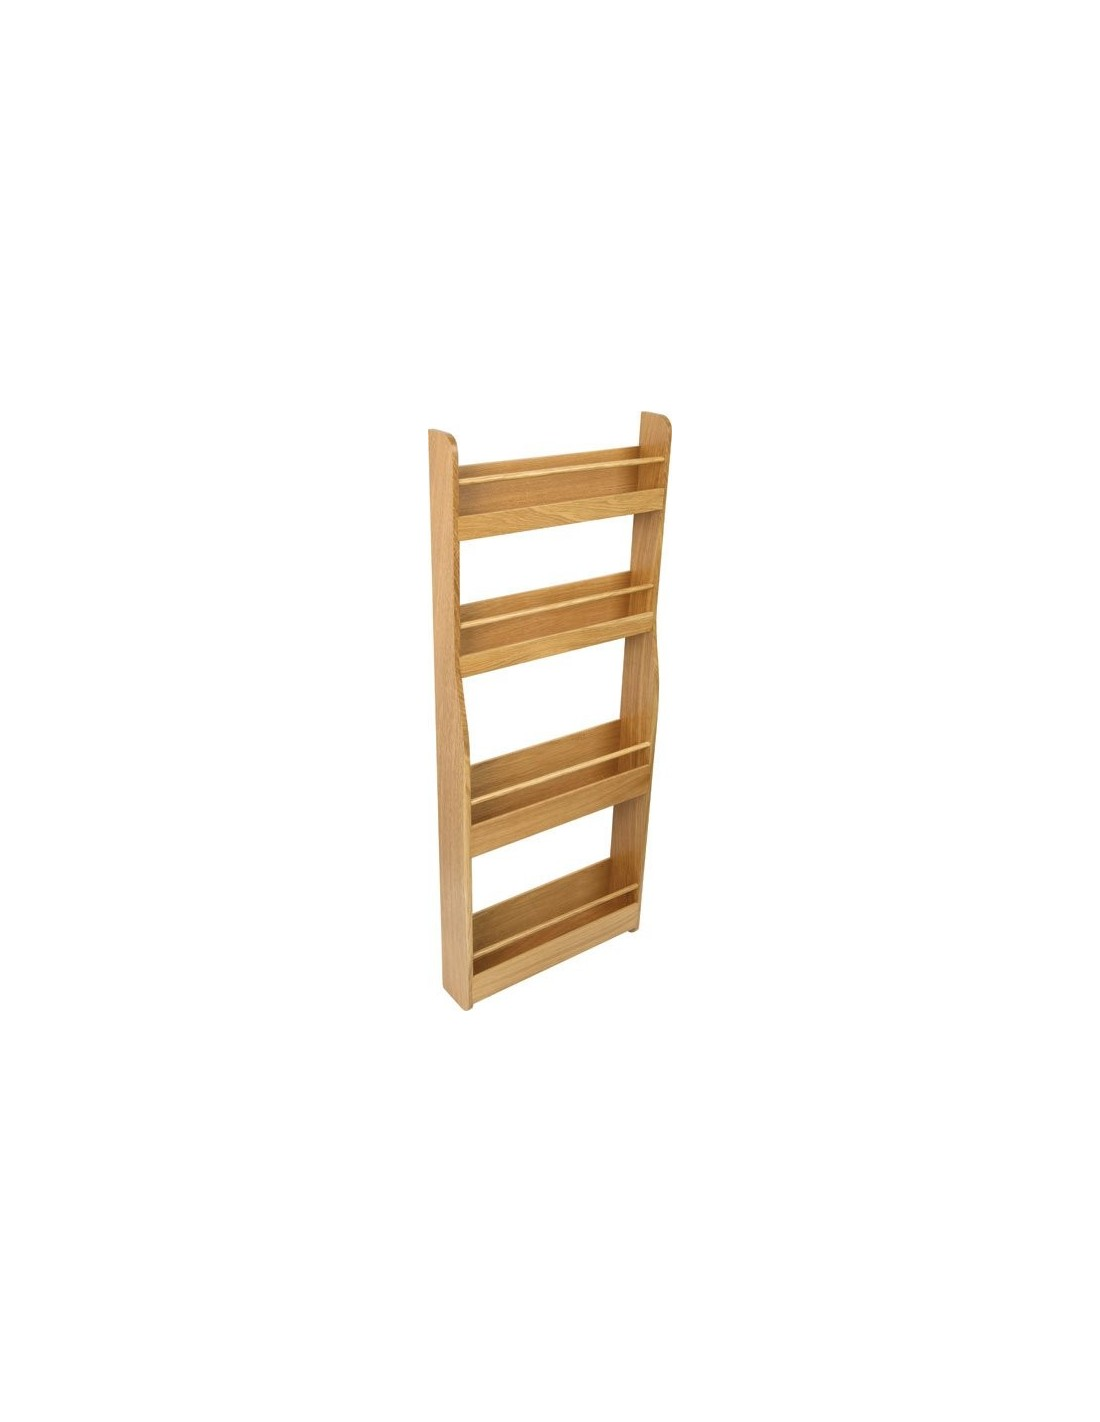 Oak Tall Storage Rack For Pantry \u0026 Larder Doors ...  sc 1 st  East Coast Kitchens & 54313423 SOLID OAK Tall Storage Rack Shelving Suits Door Fix £149